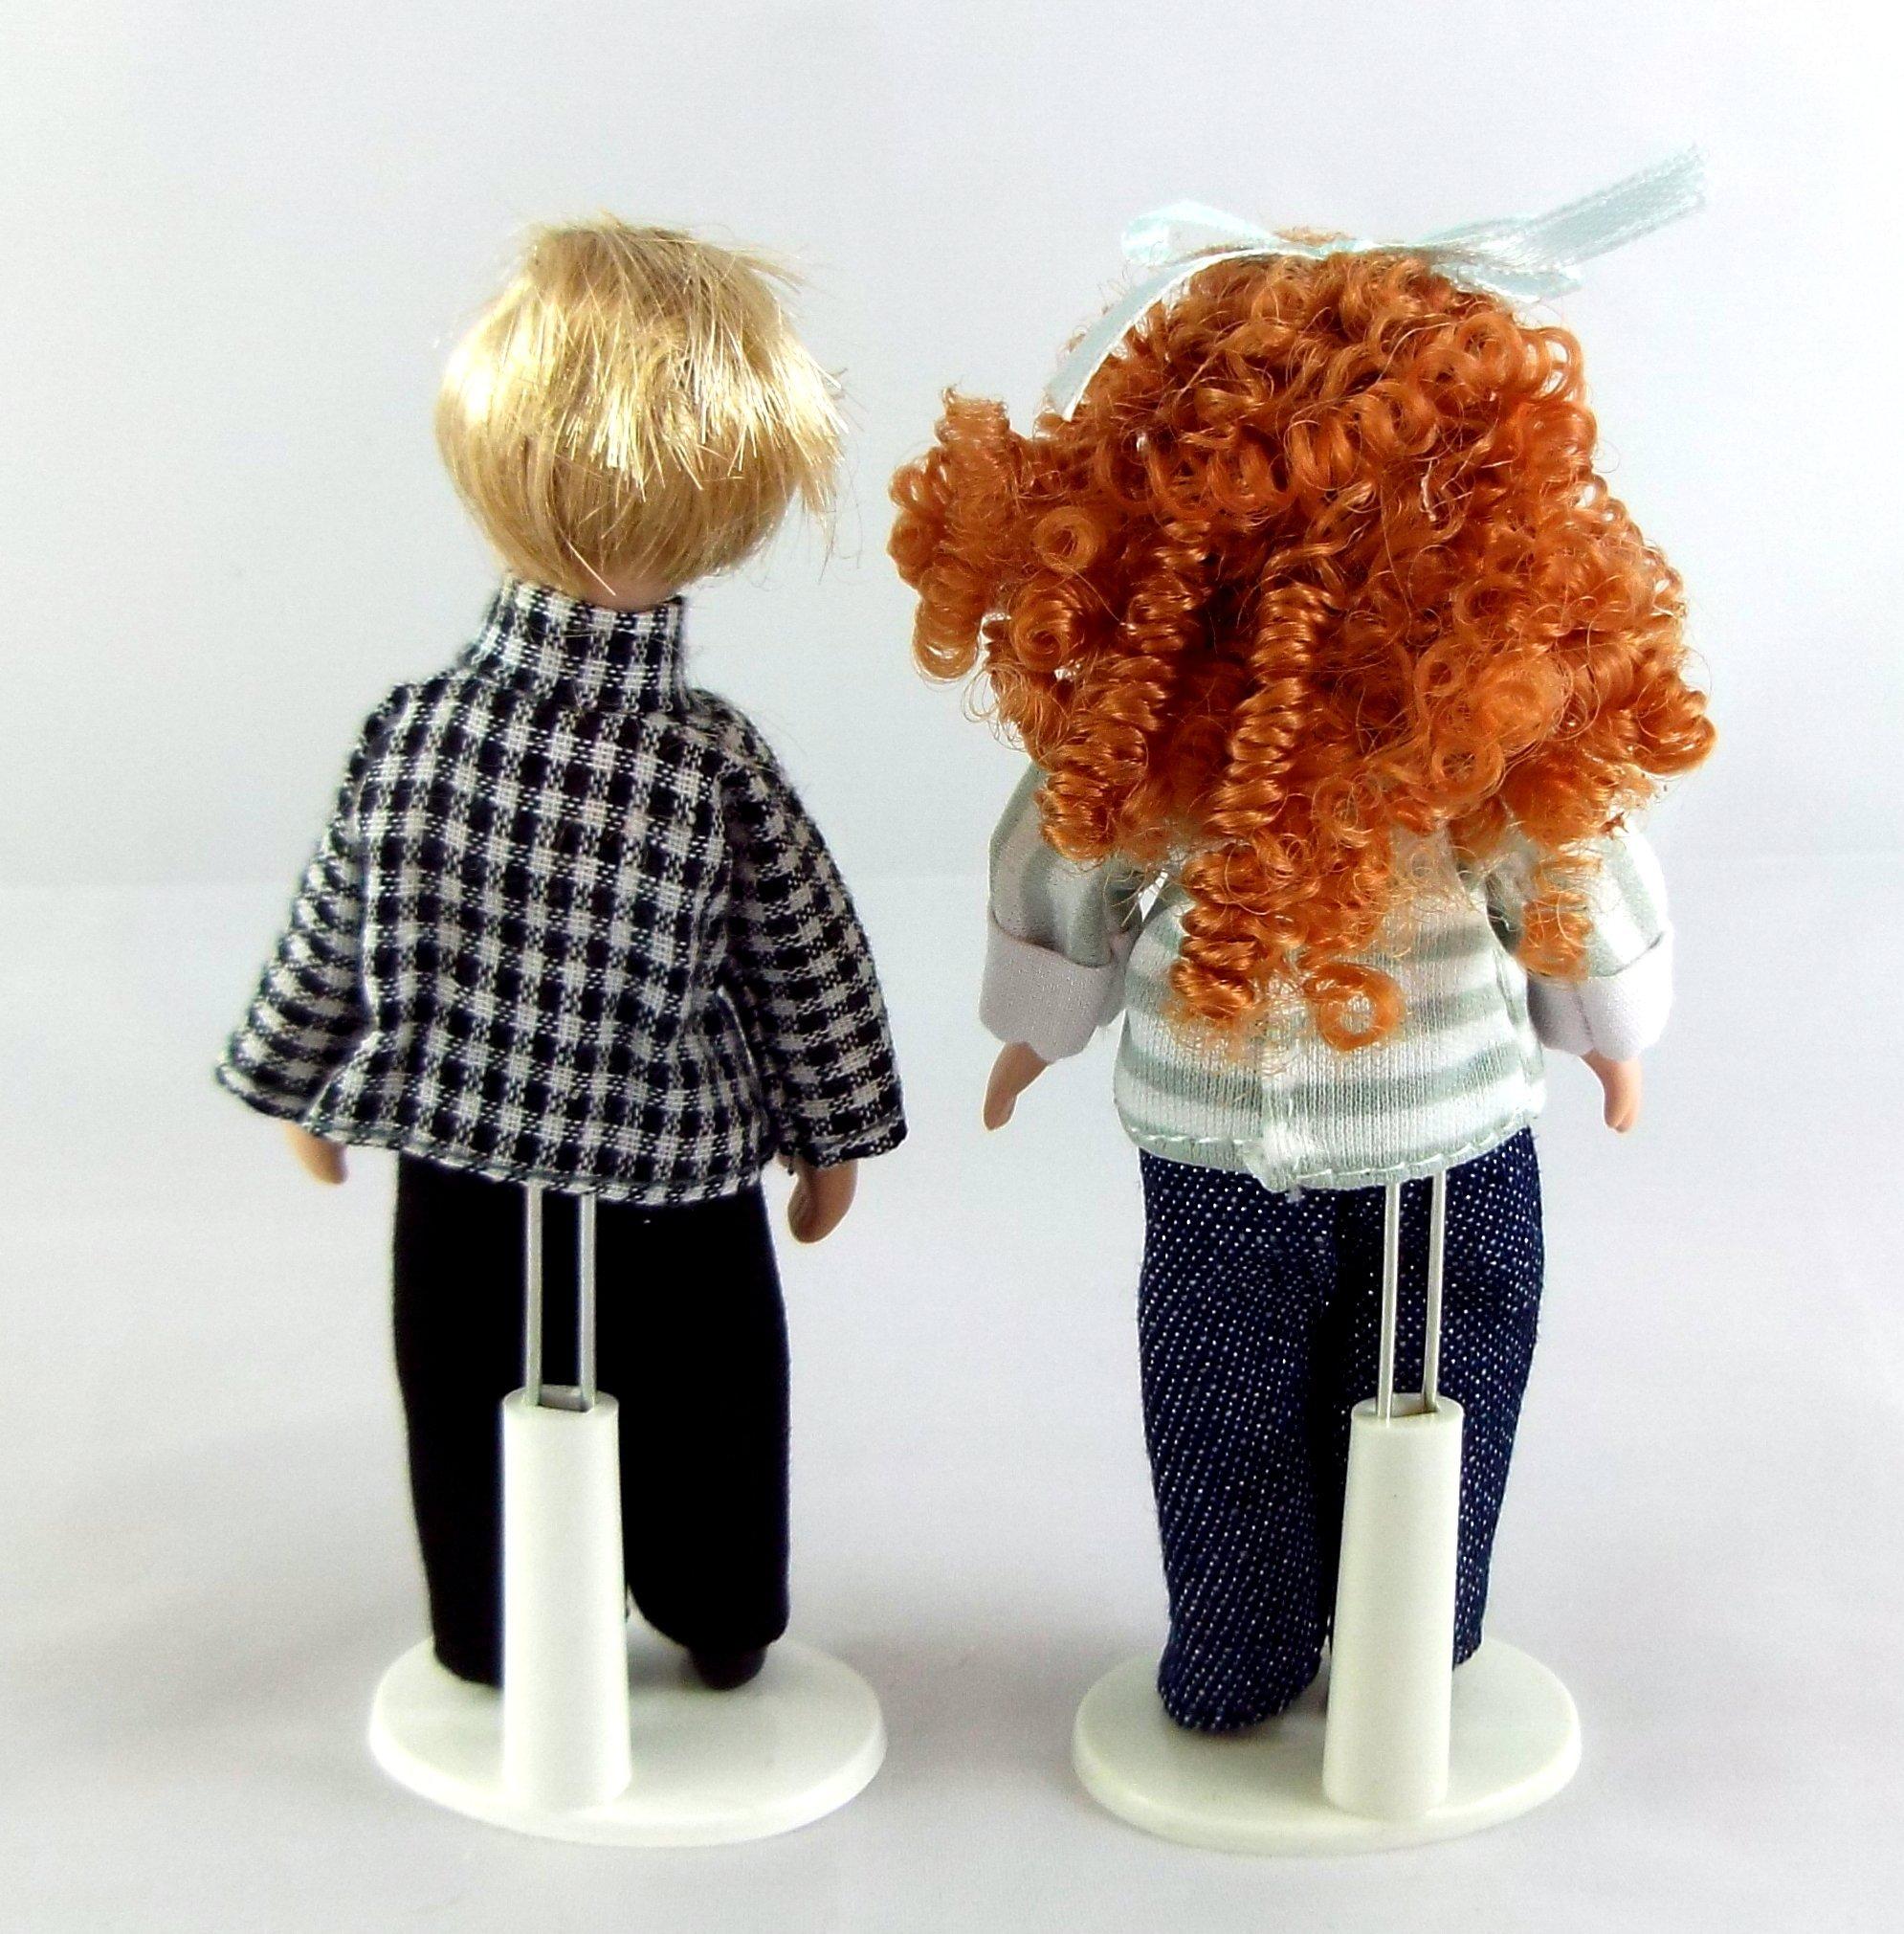 Vanity Fair Dolls House Miniature People Children Girl & Boy 311